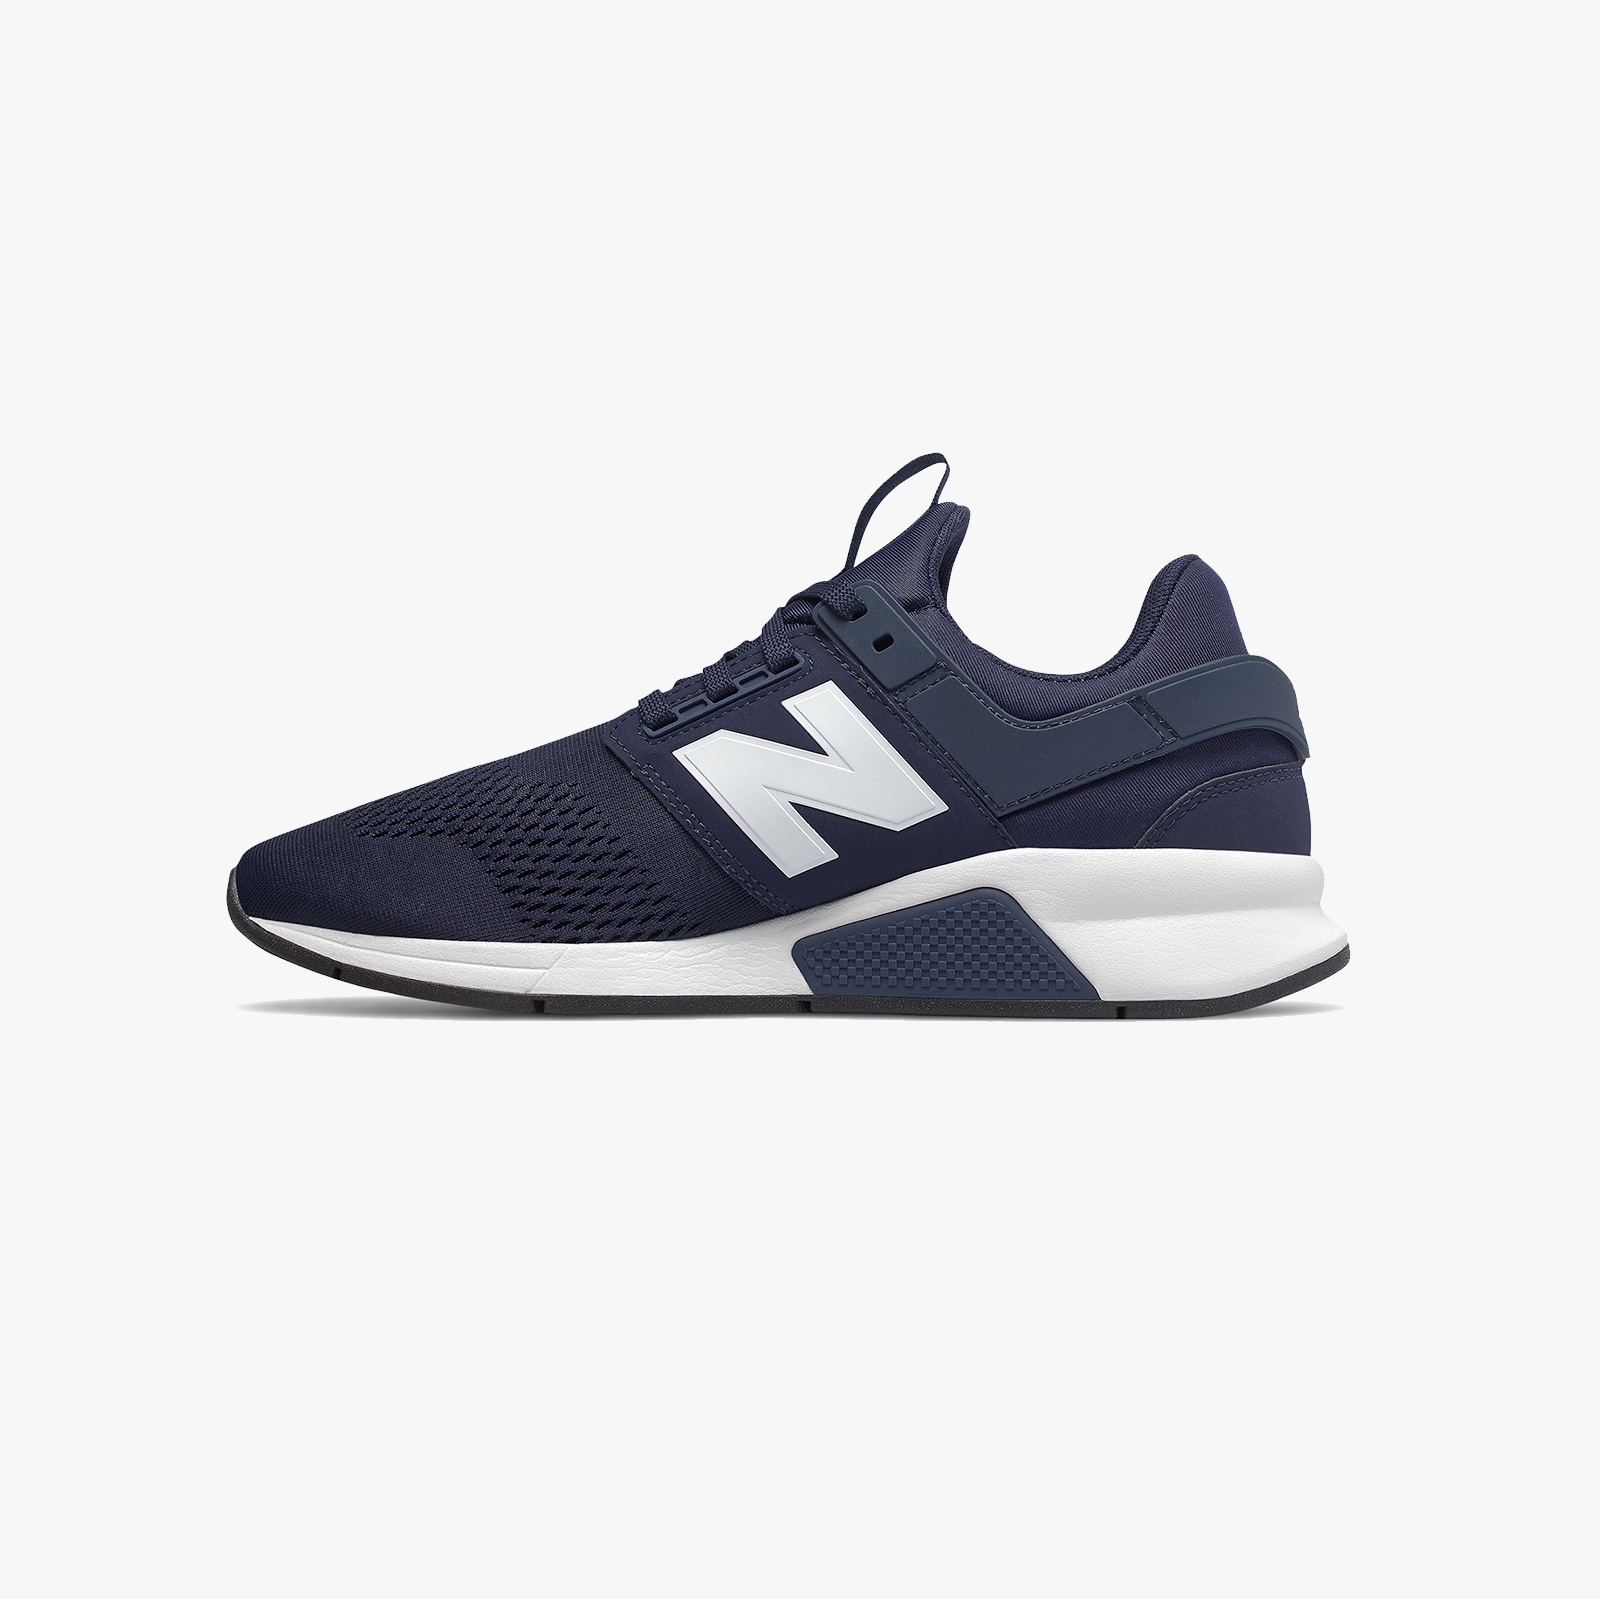 New Balance M247 Ms247en Sneakersnstuff I Sneakers